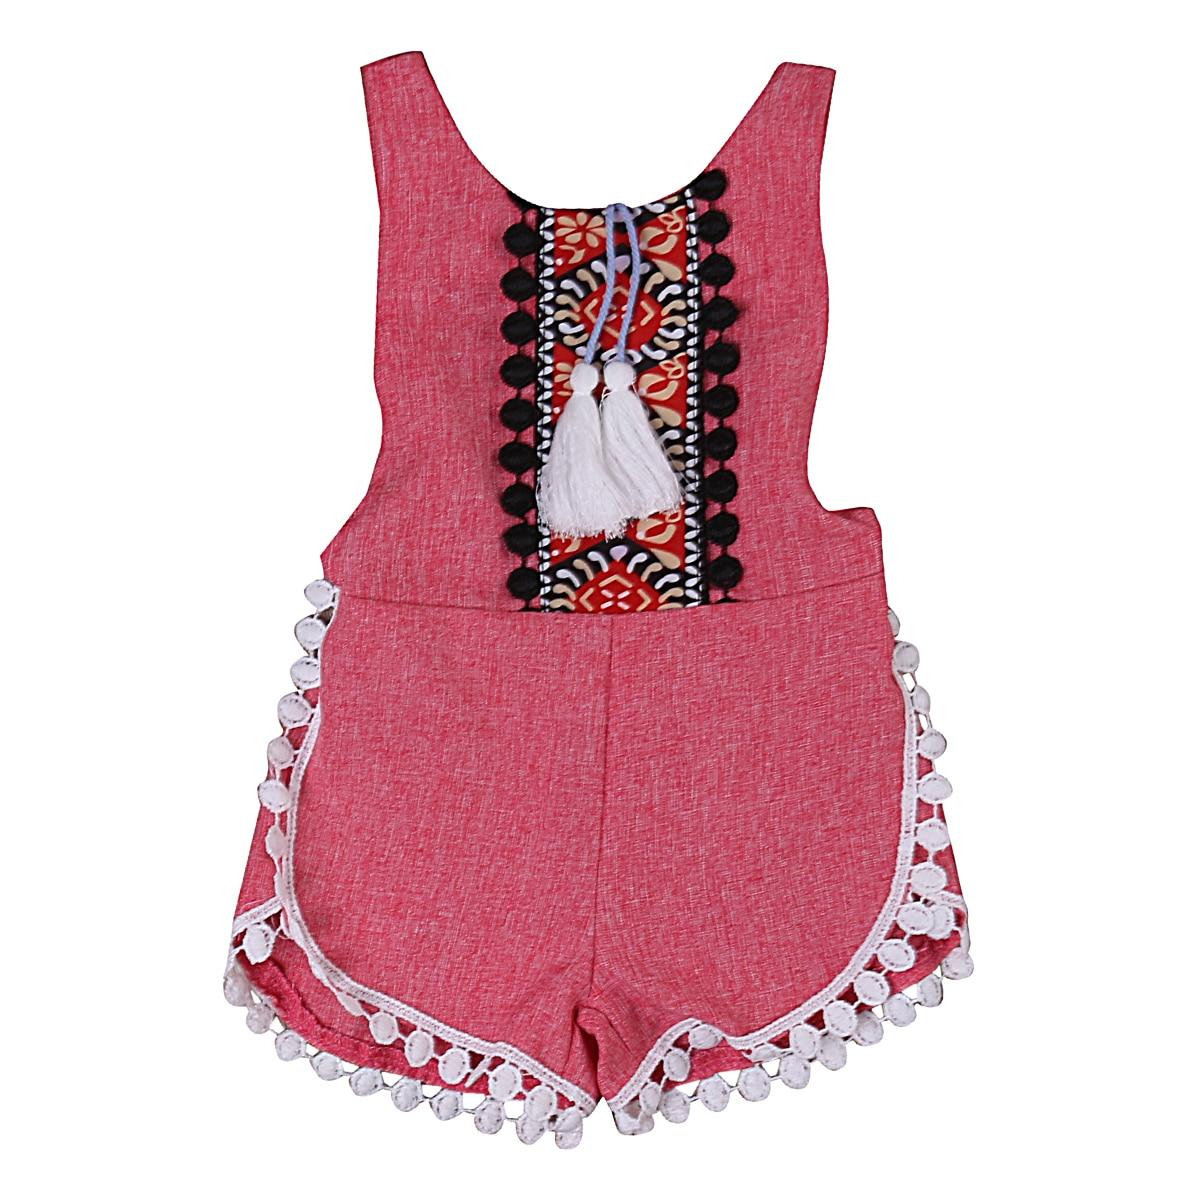 c8ac0cb562a0 Cute Ethnic Pendant Tassels Romper Newborn Baby Girls sleeveless Romper  Jumpsuit playsuit Sunsuit Set Clothes